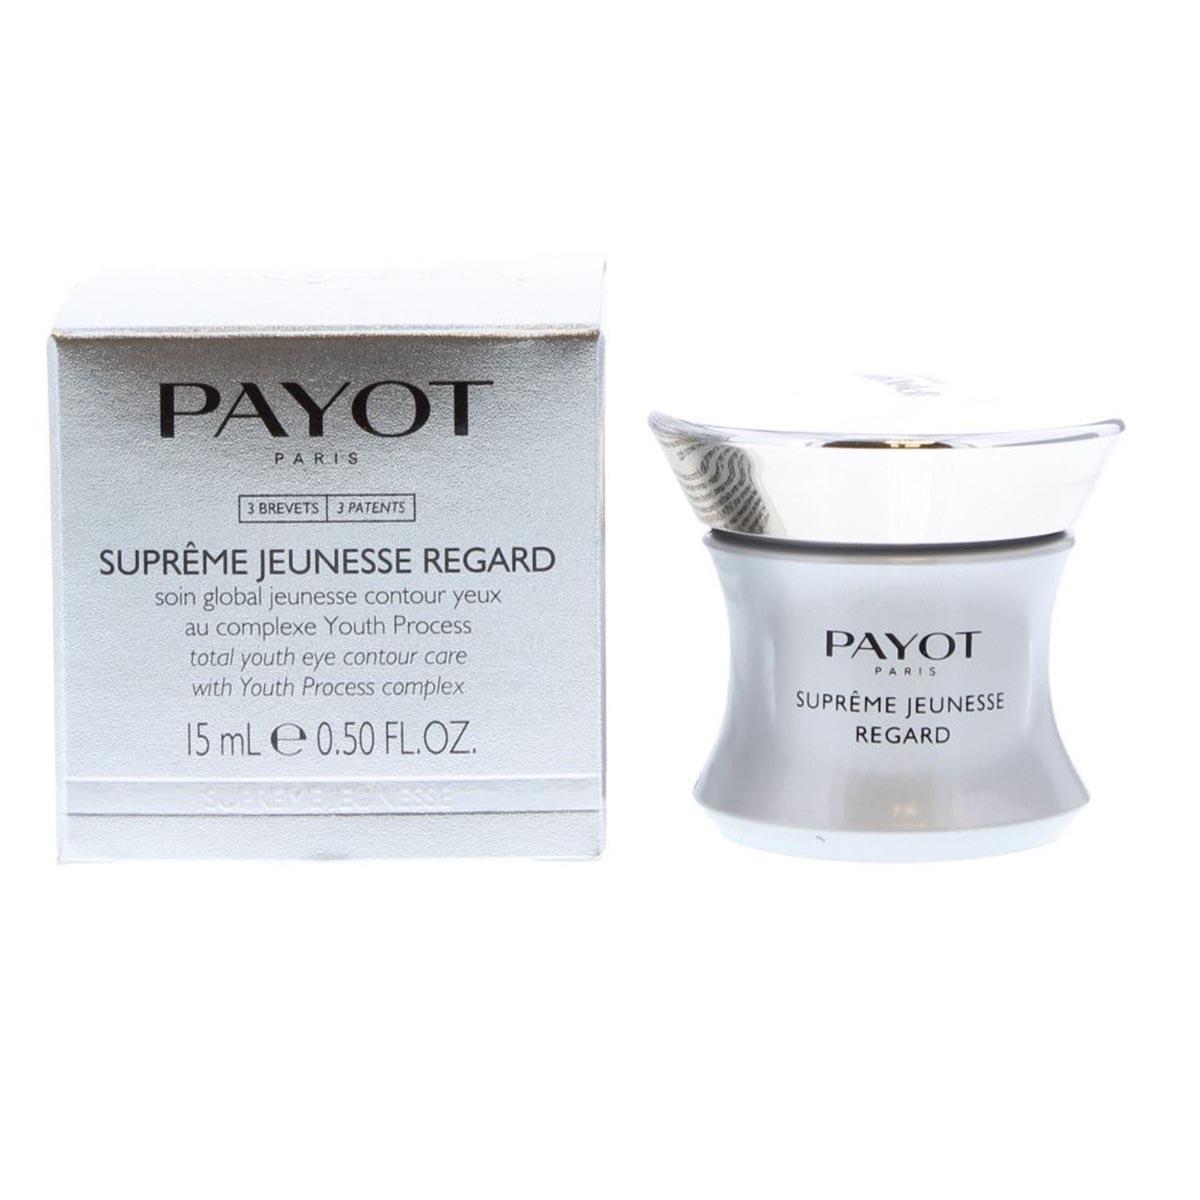 Payot supreme jeunesse regard 15ml